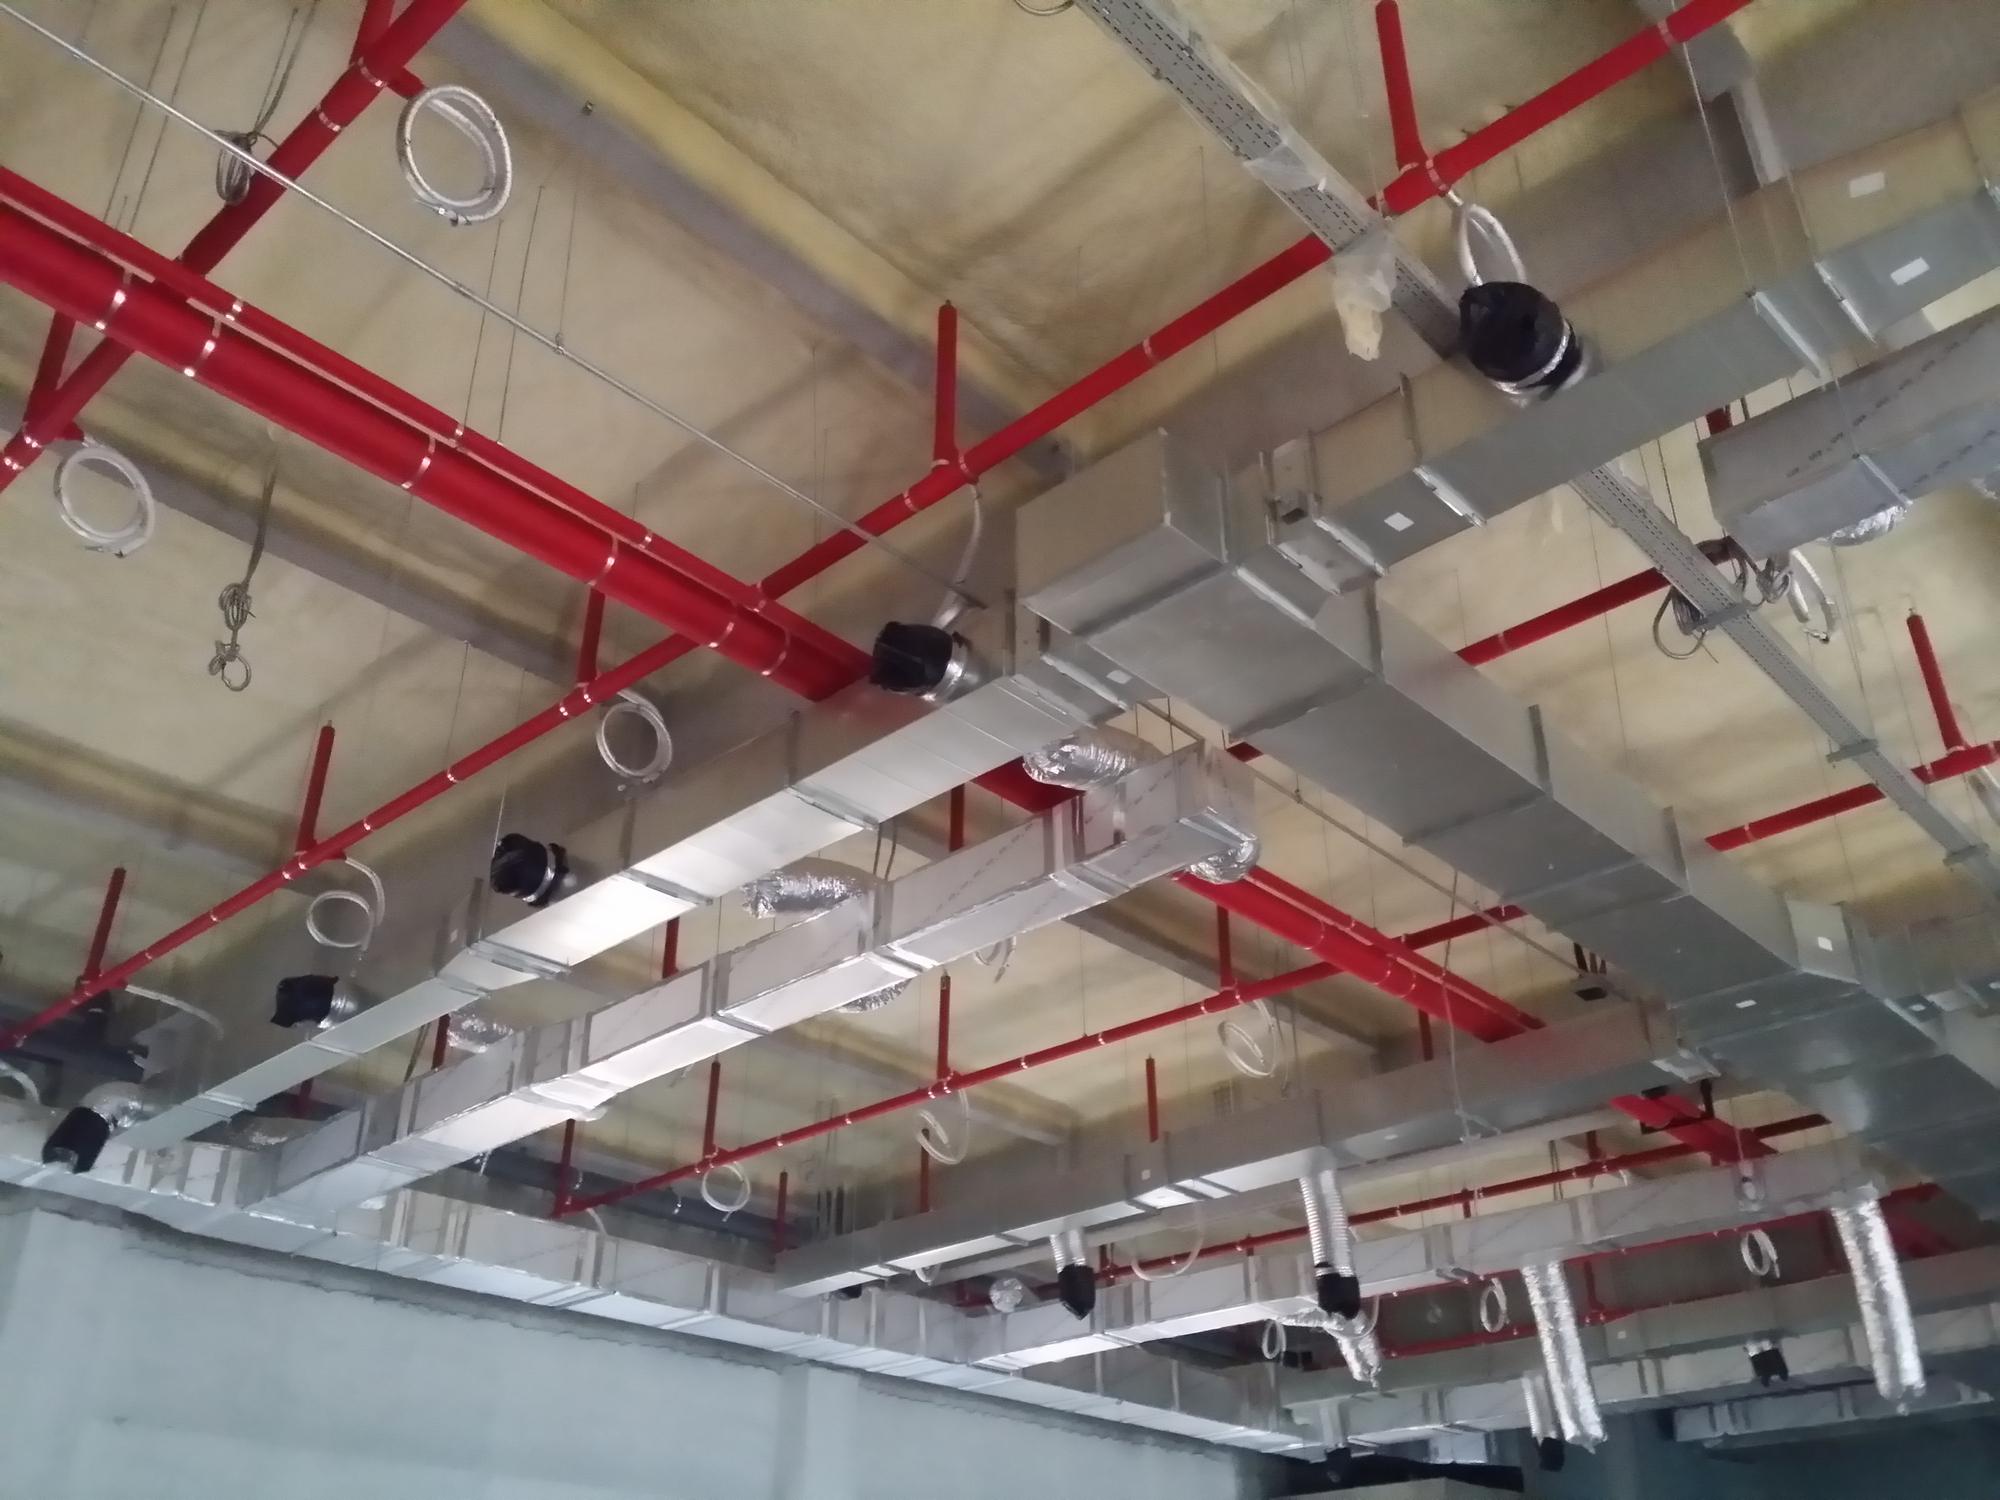 Fire Ventilation & Smoke Integrity Testing